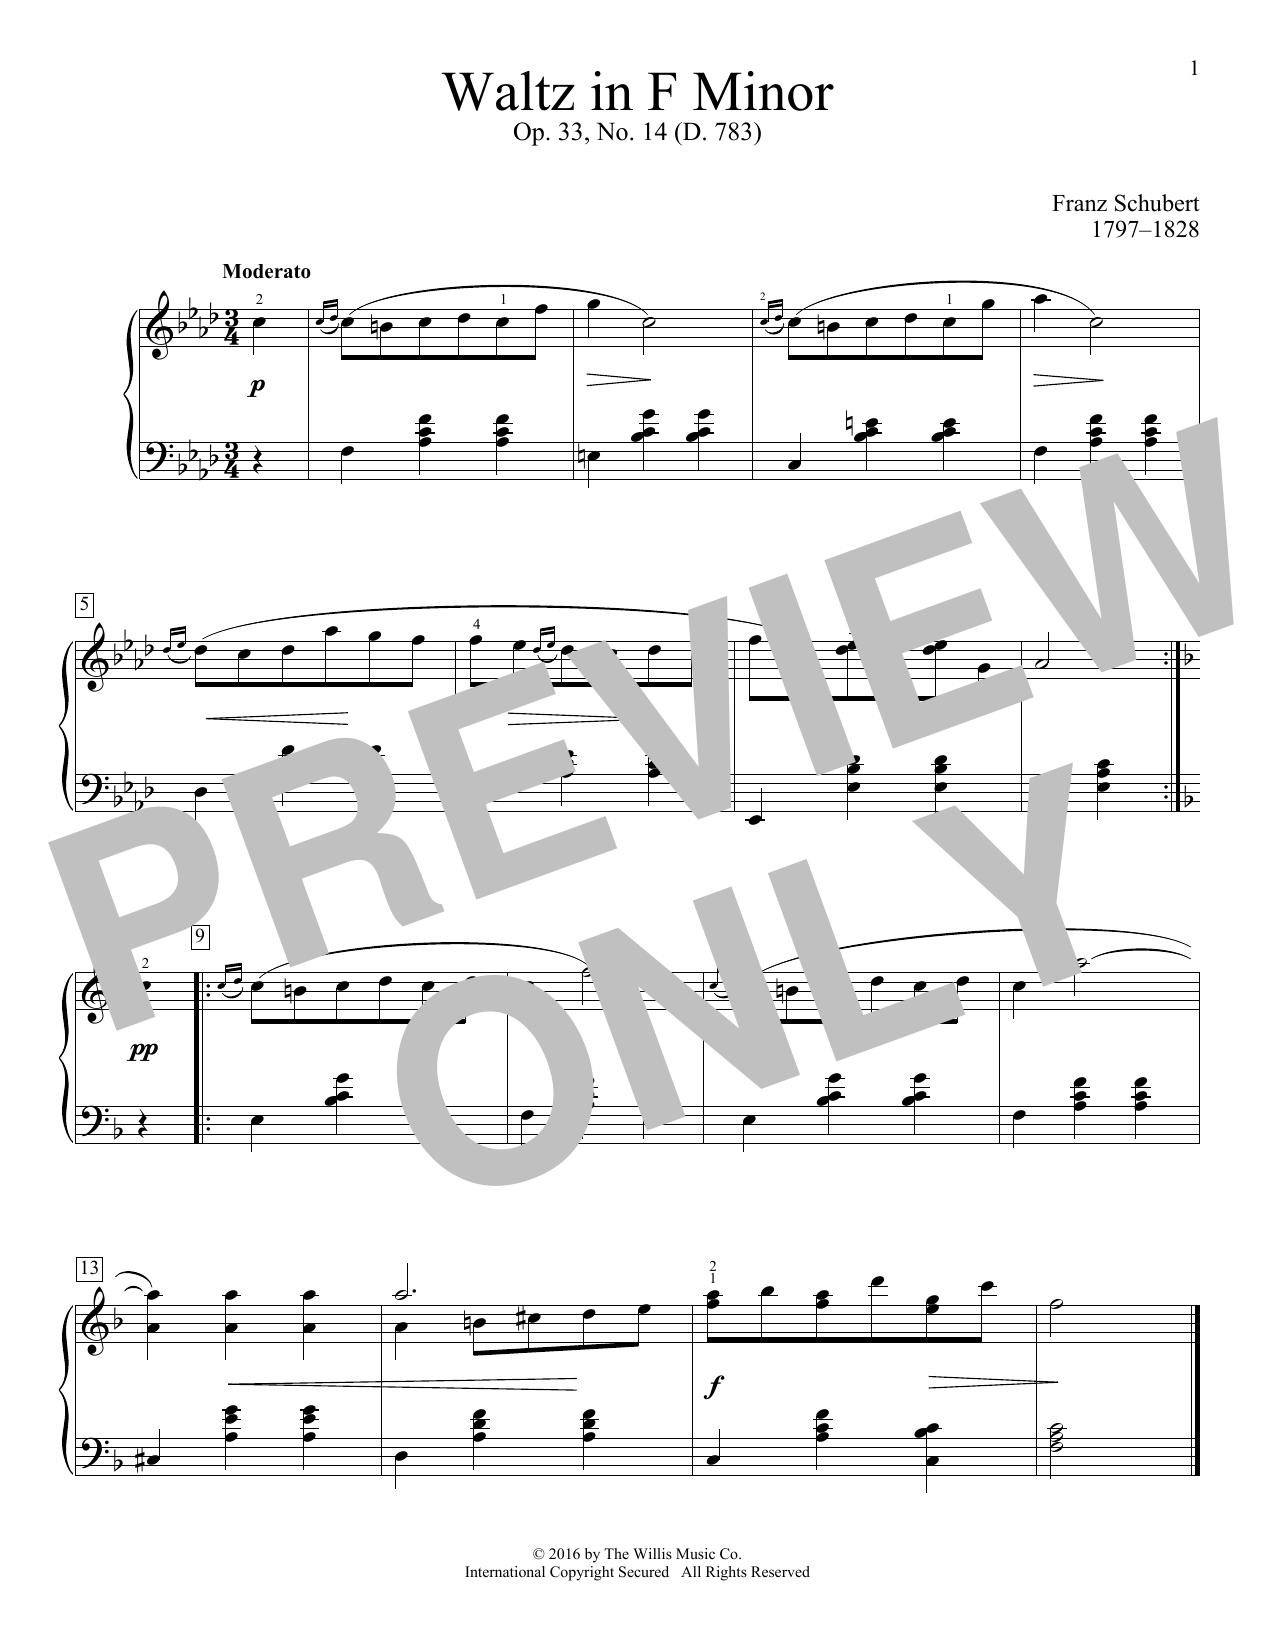 Waltz In F Minor, Op. 33, No. 14 (D. 783) Sheet Music